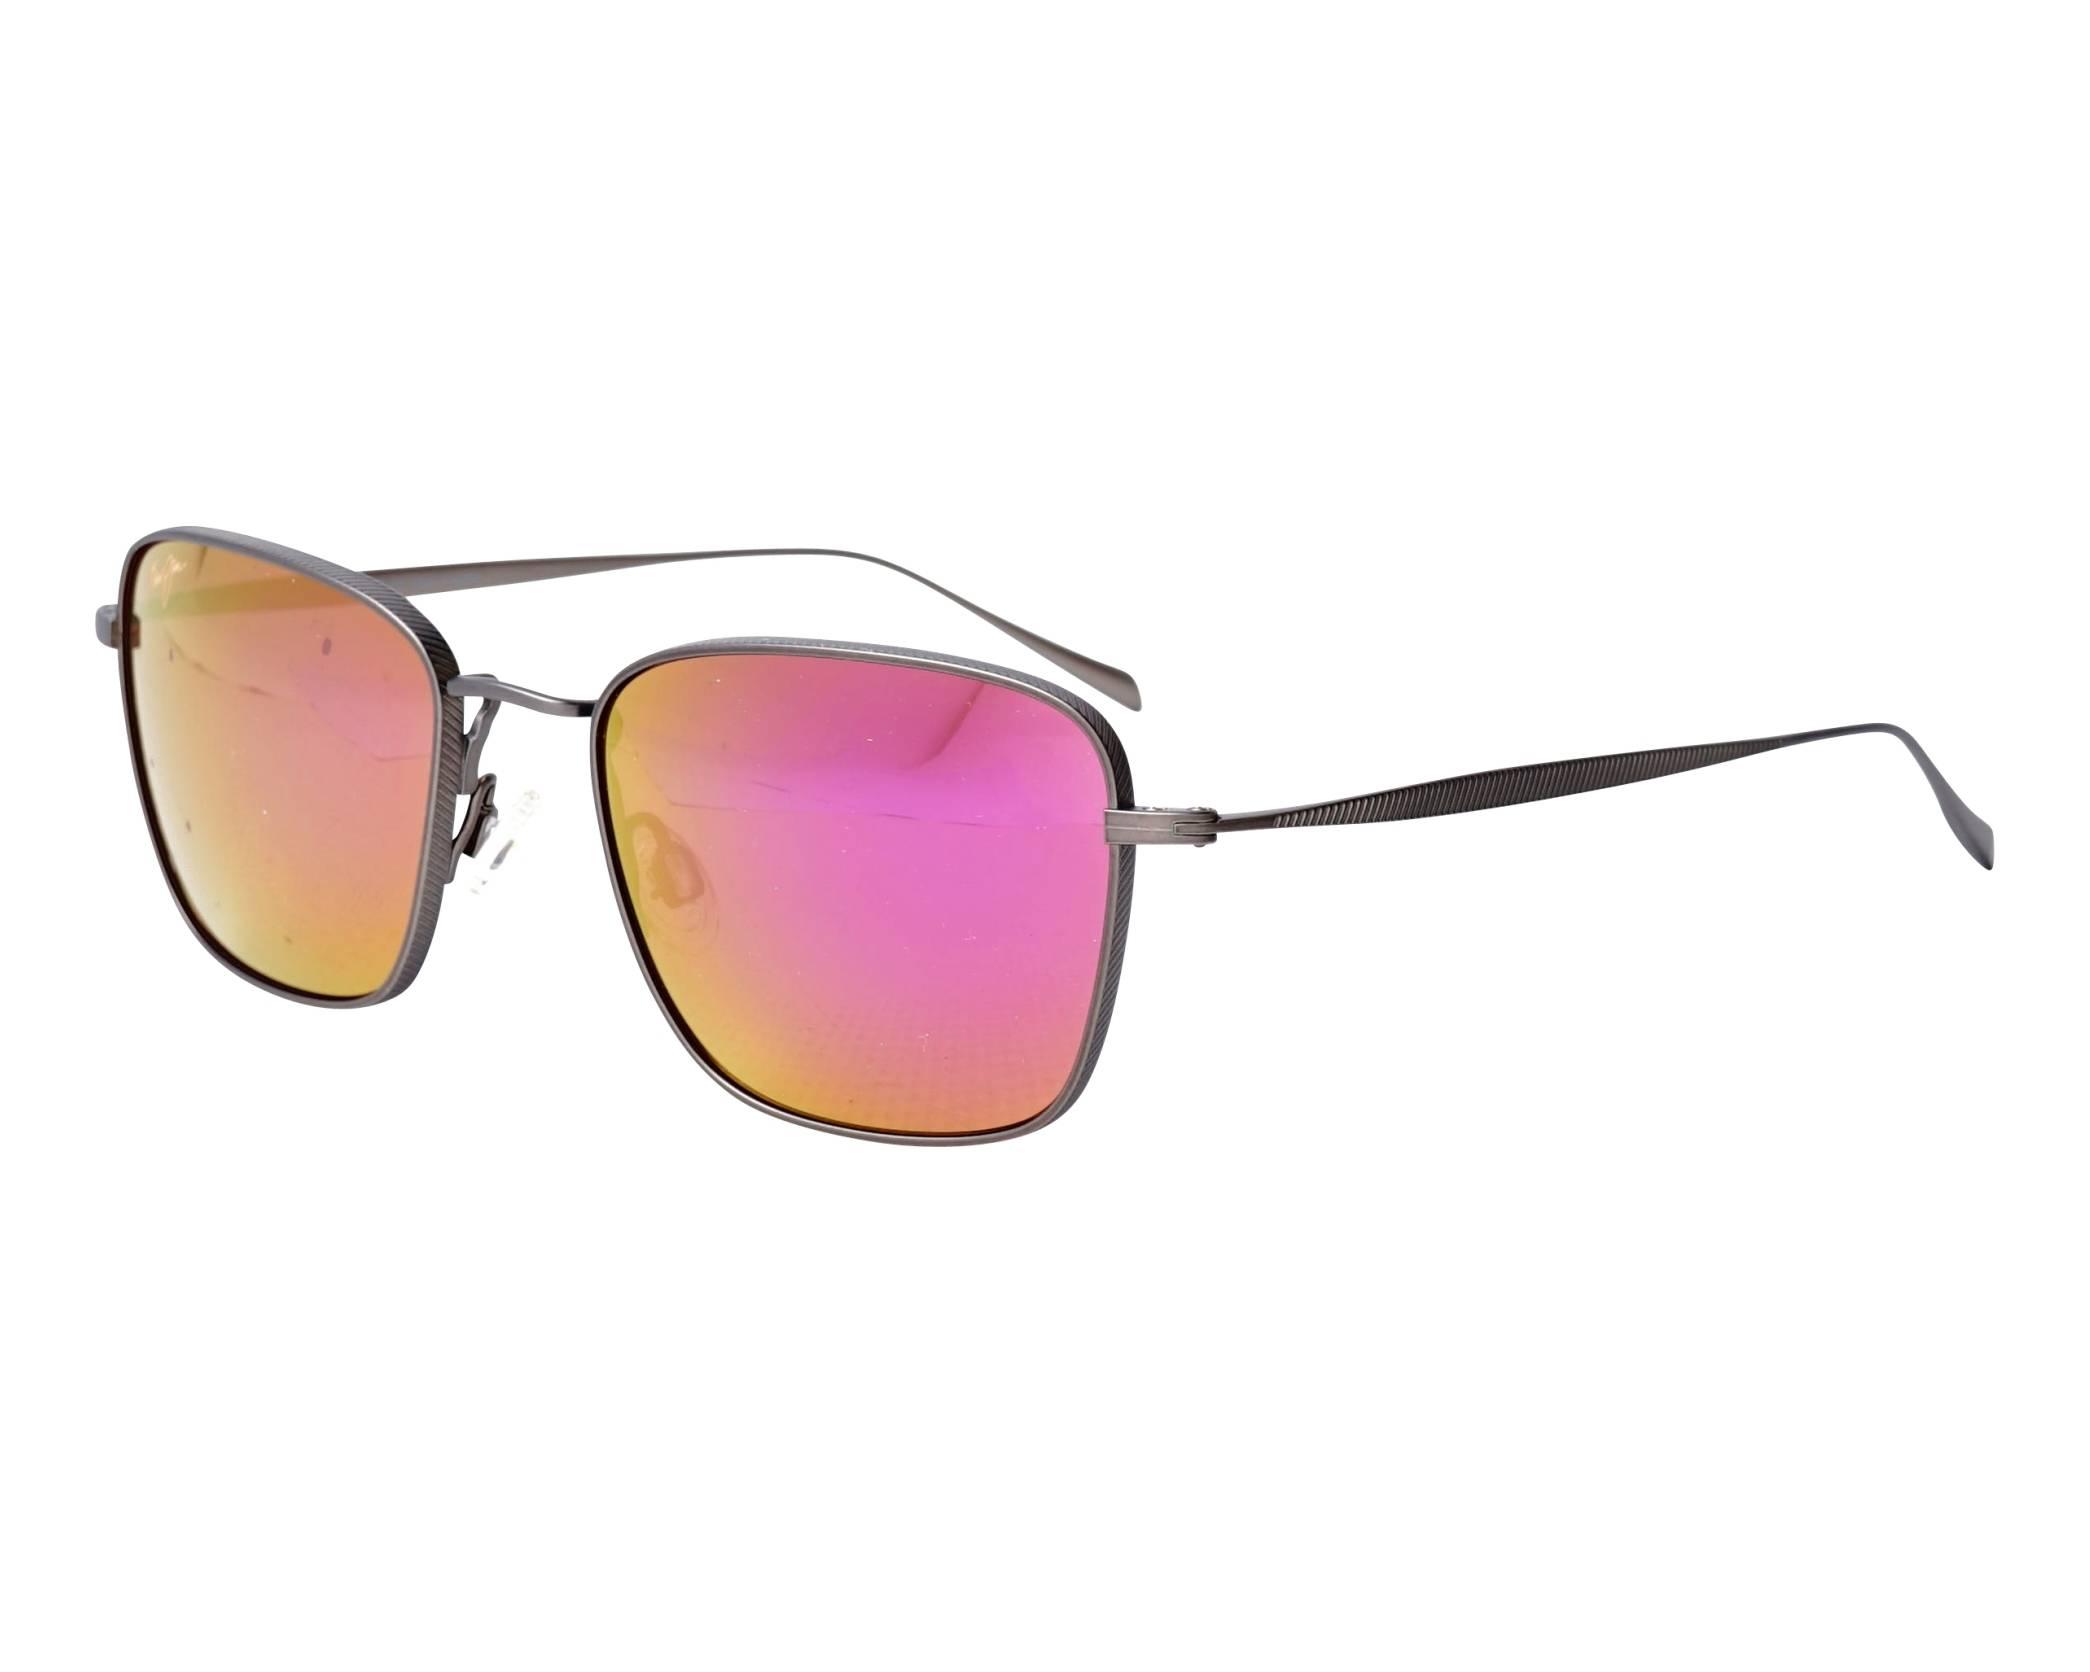 10333bbf26f43 Sunglasses Maui Jim SPINNAKER P-545-14 54-19 Ruthenium profile view